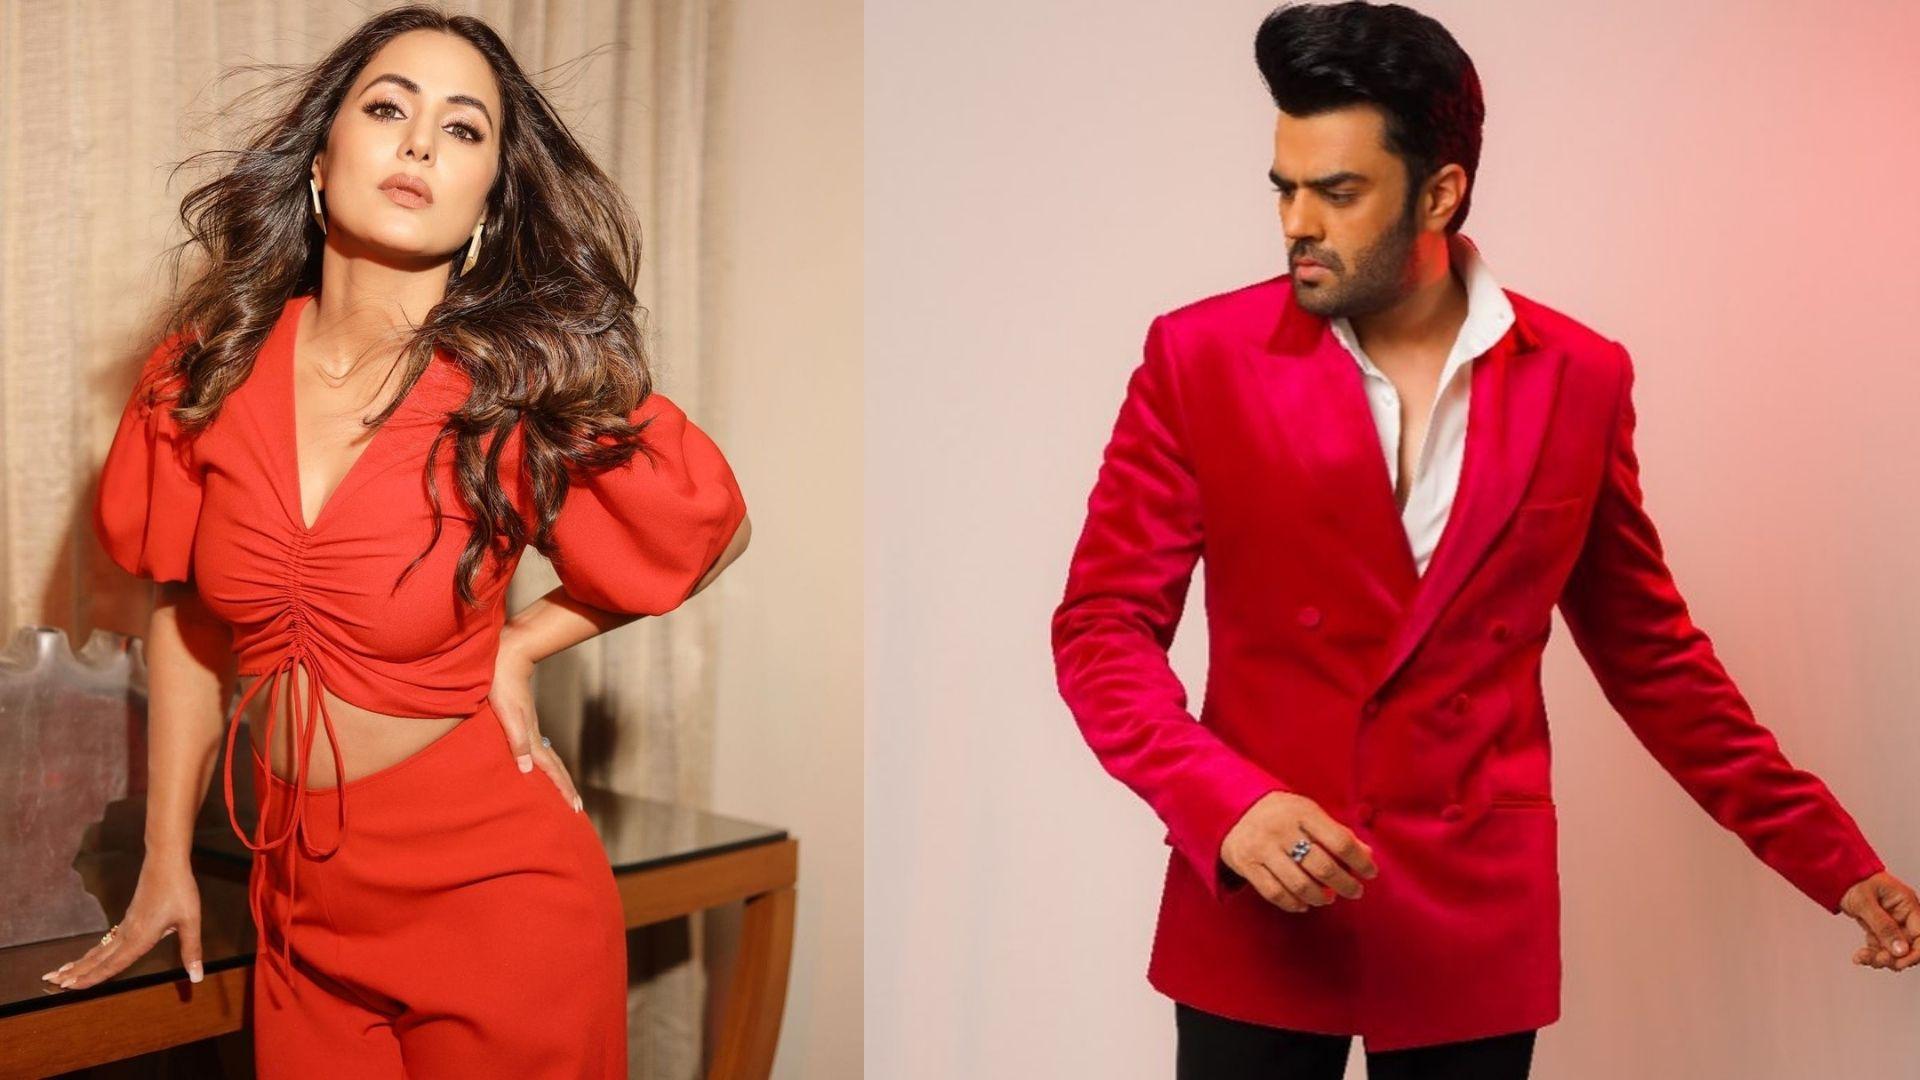 Bigg Boss 15 Weekend Ka Vaar: Hina Khan And Maniesh Paul To Give Contestants A Reality Check On Salman Khan's Show – REPORTS